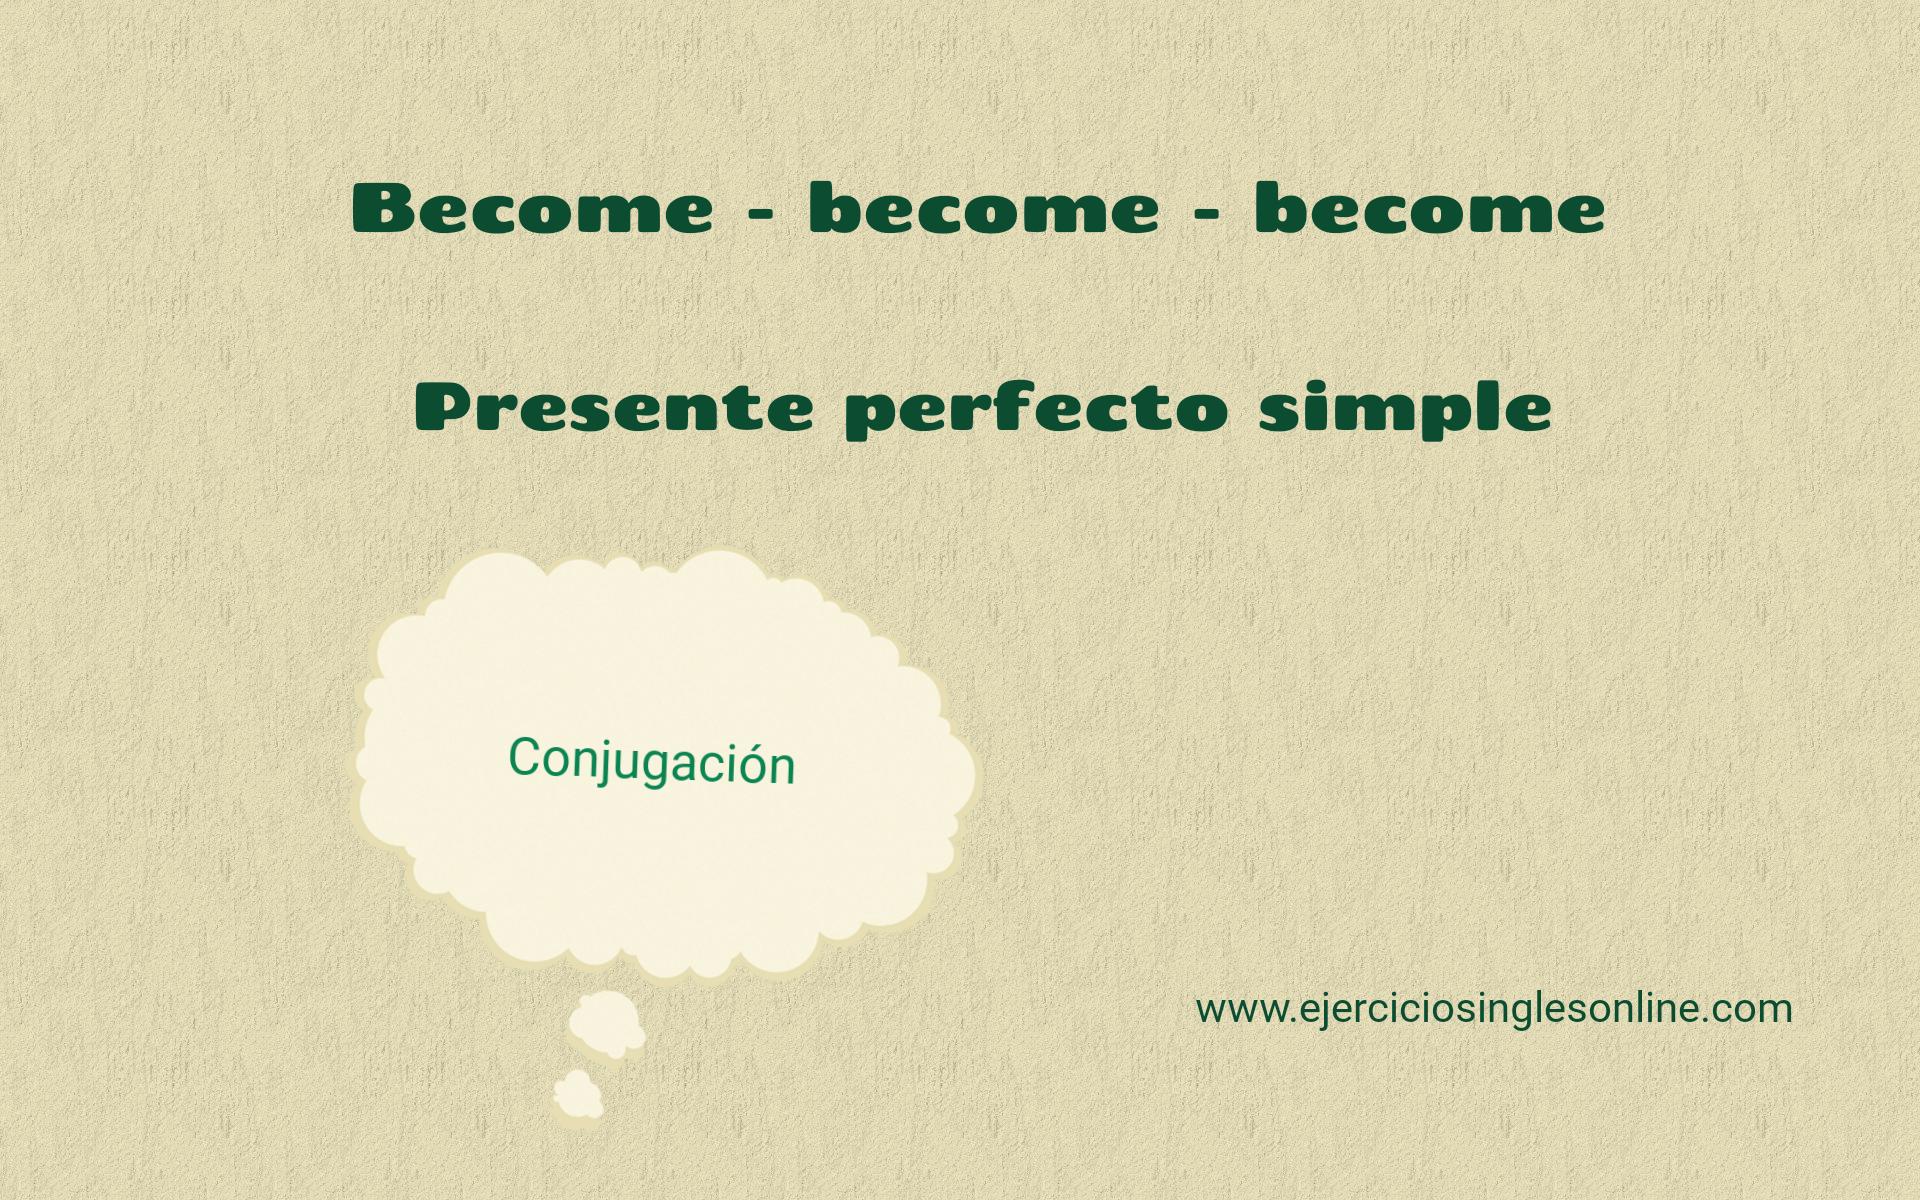 Become -Presente perfecto simple